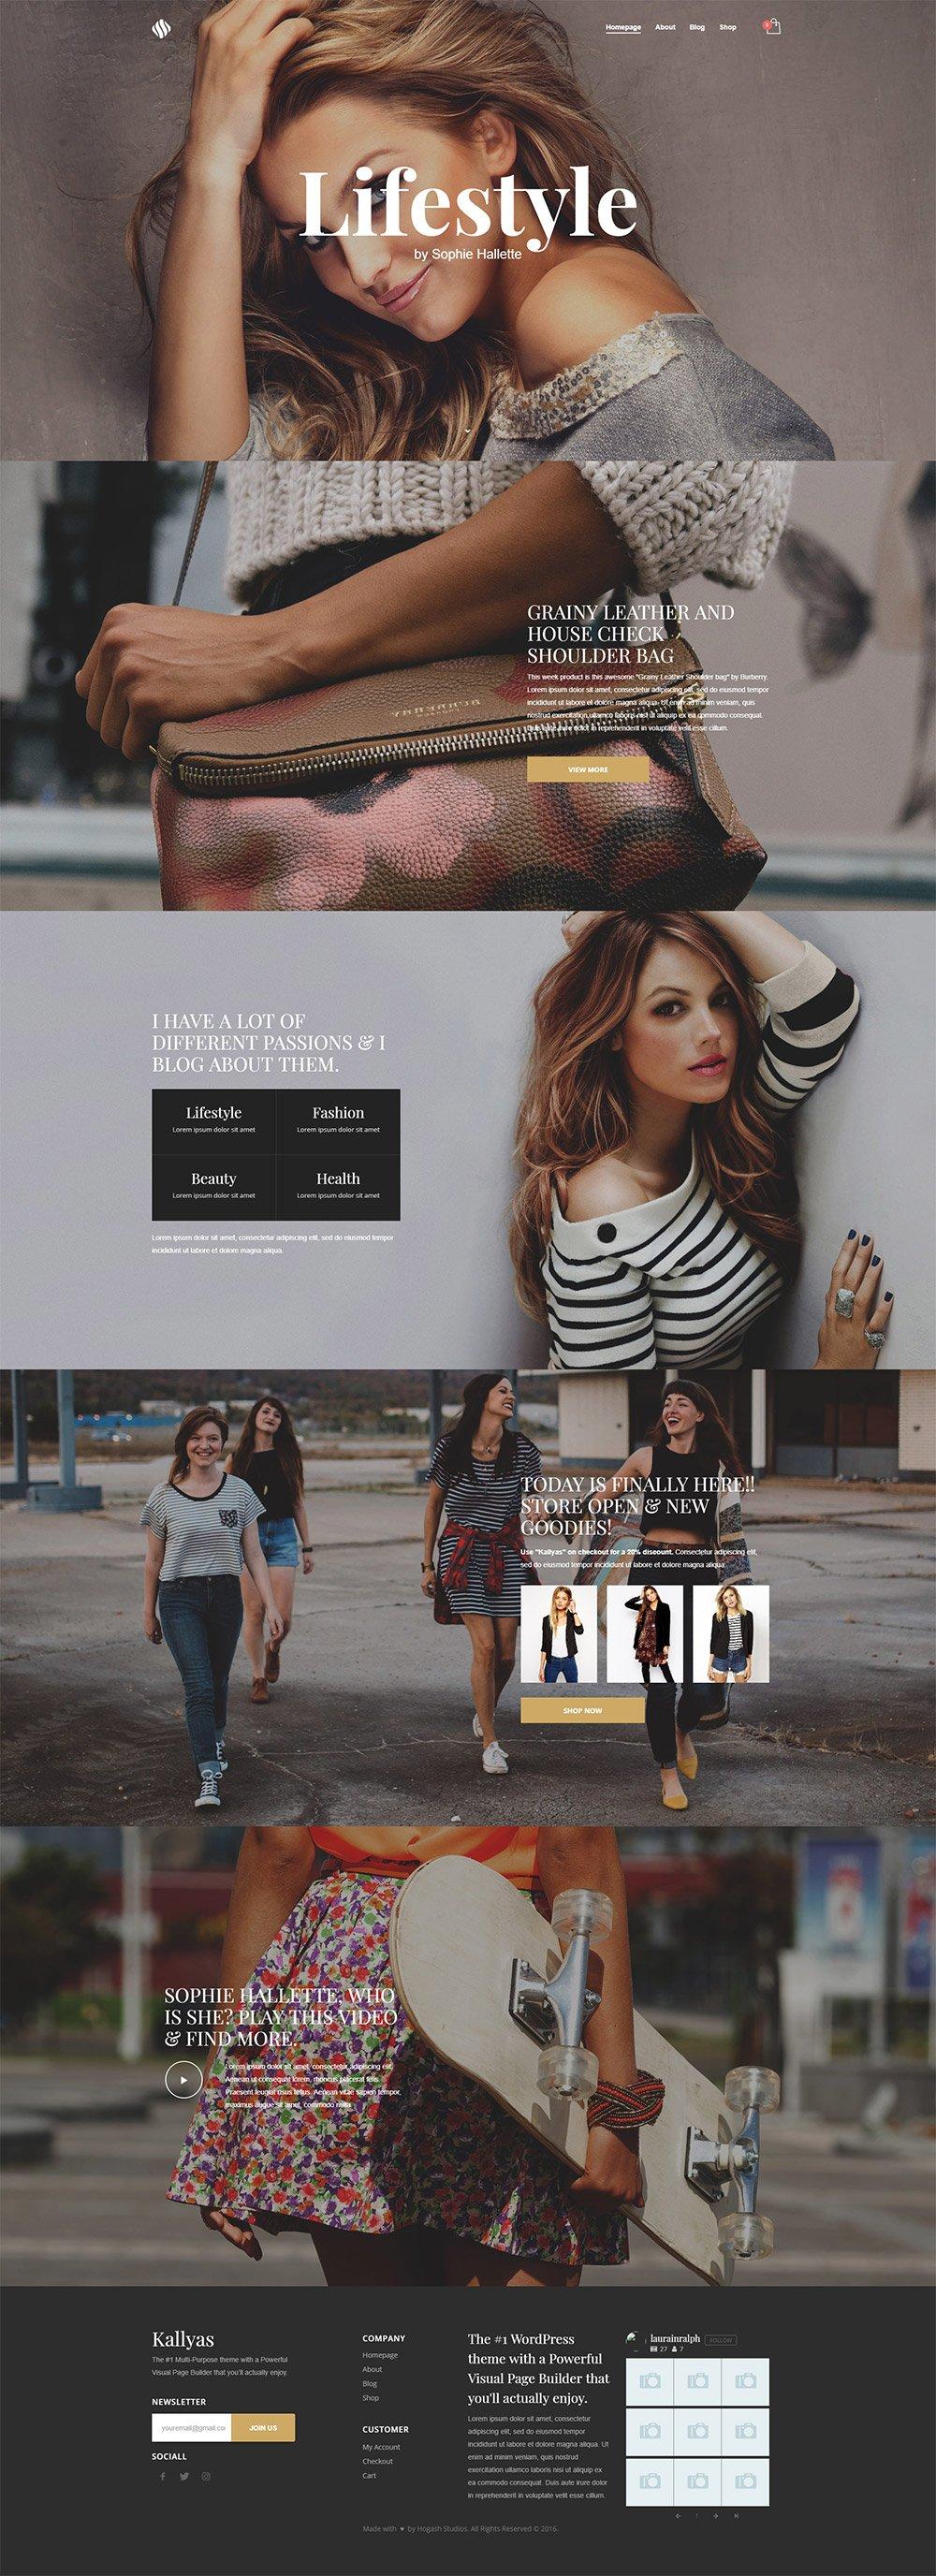 Parallax & Shop - Free PSD Template